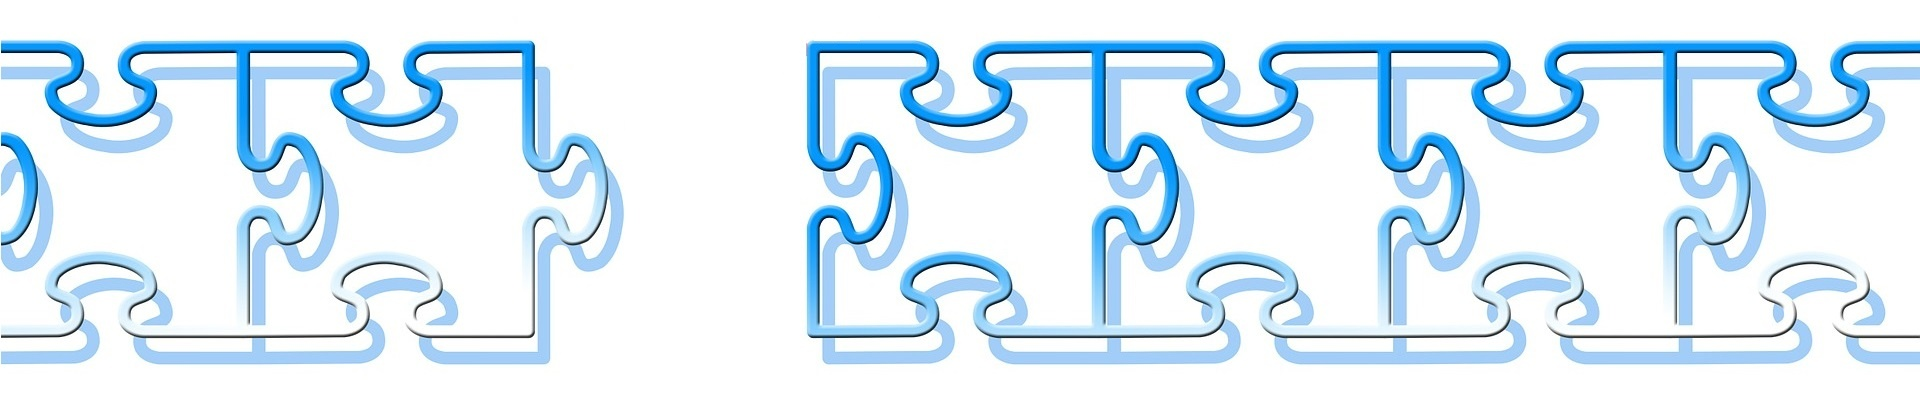 puzzle banner 2.jpg